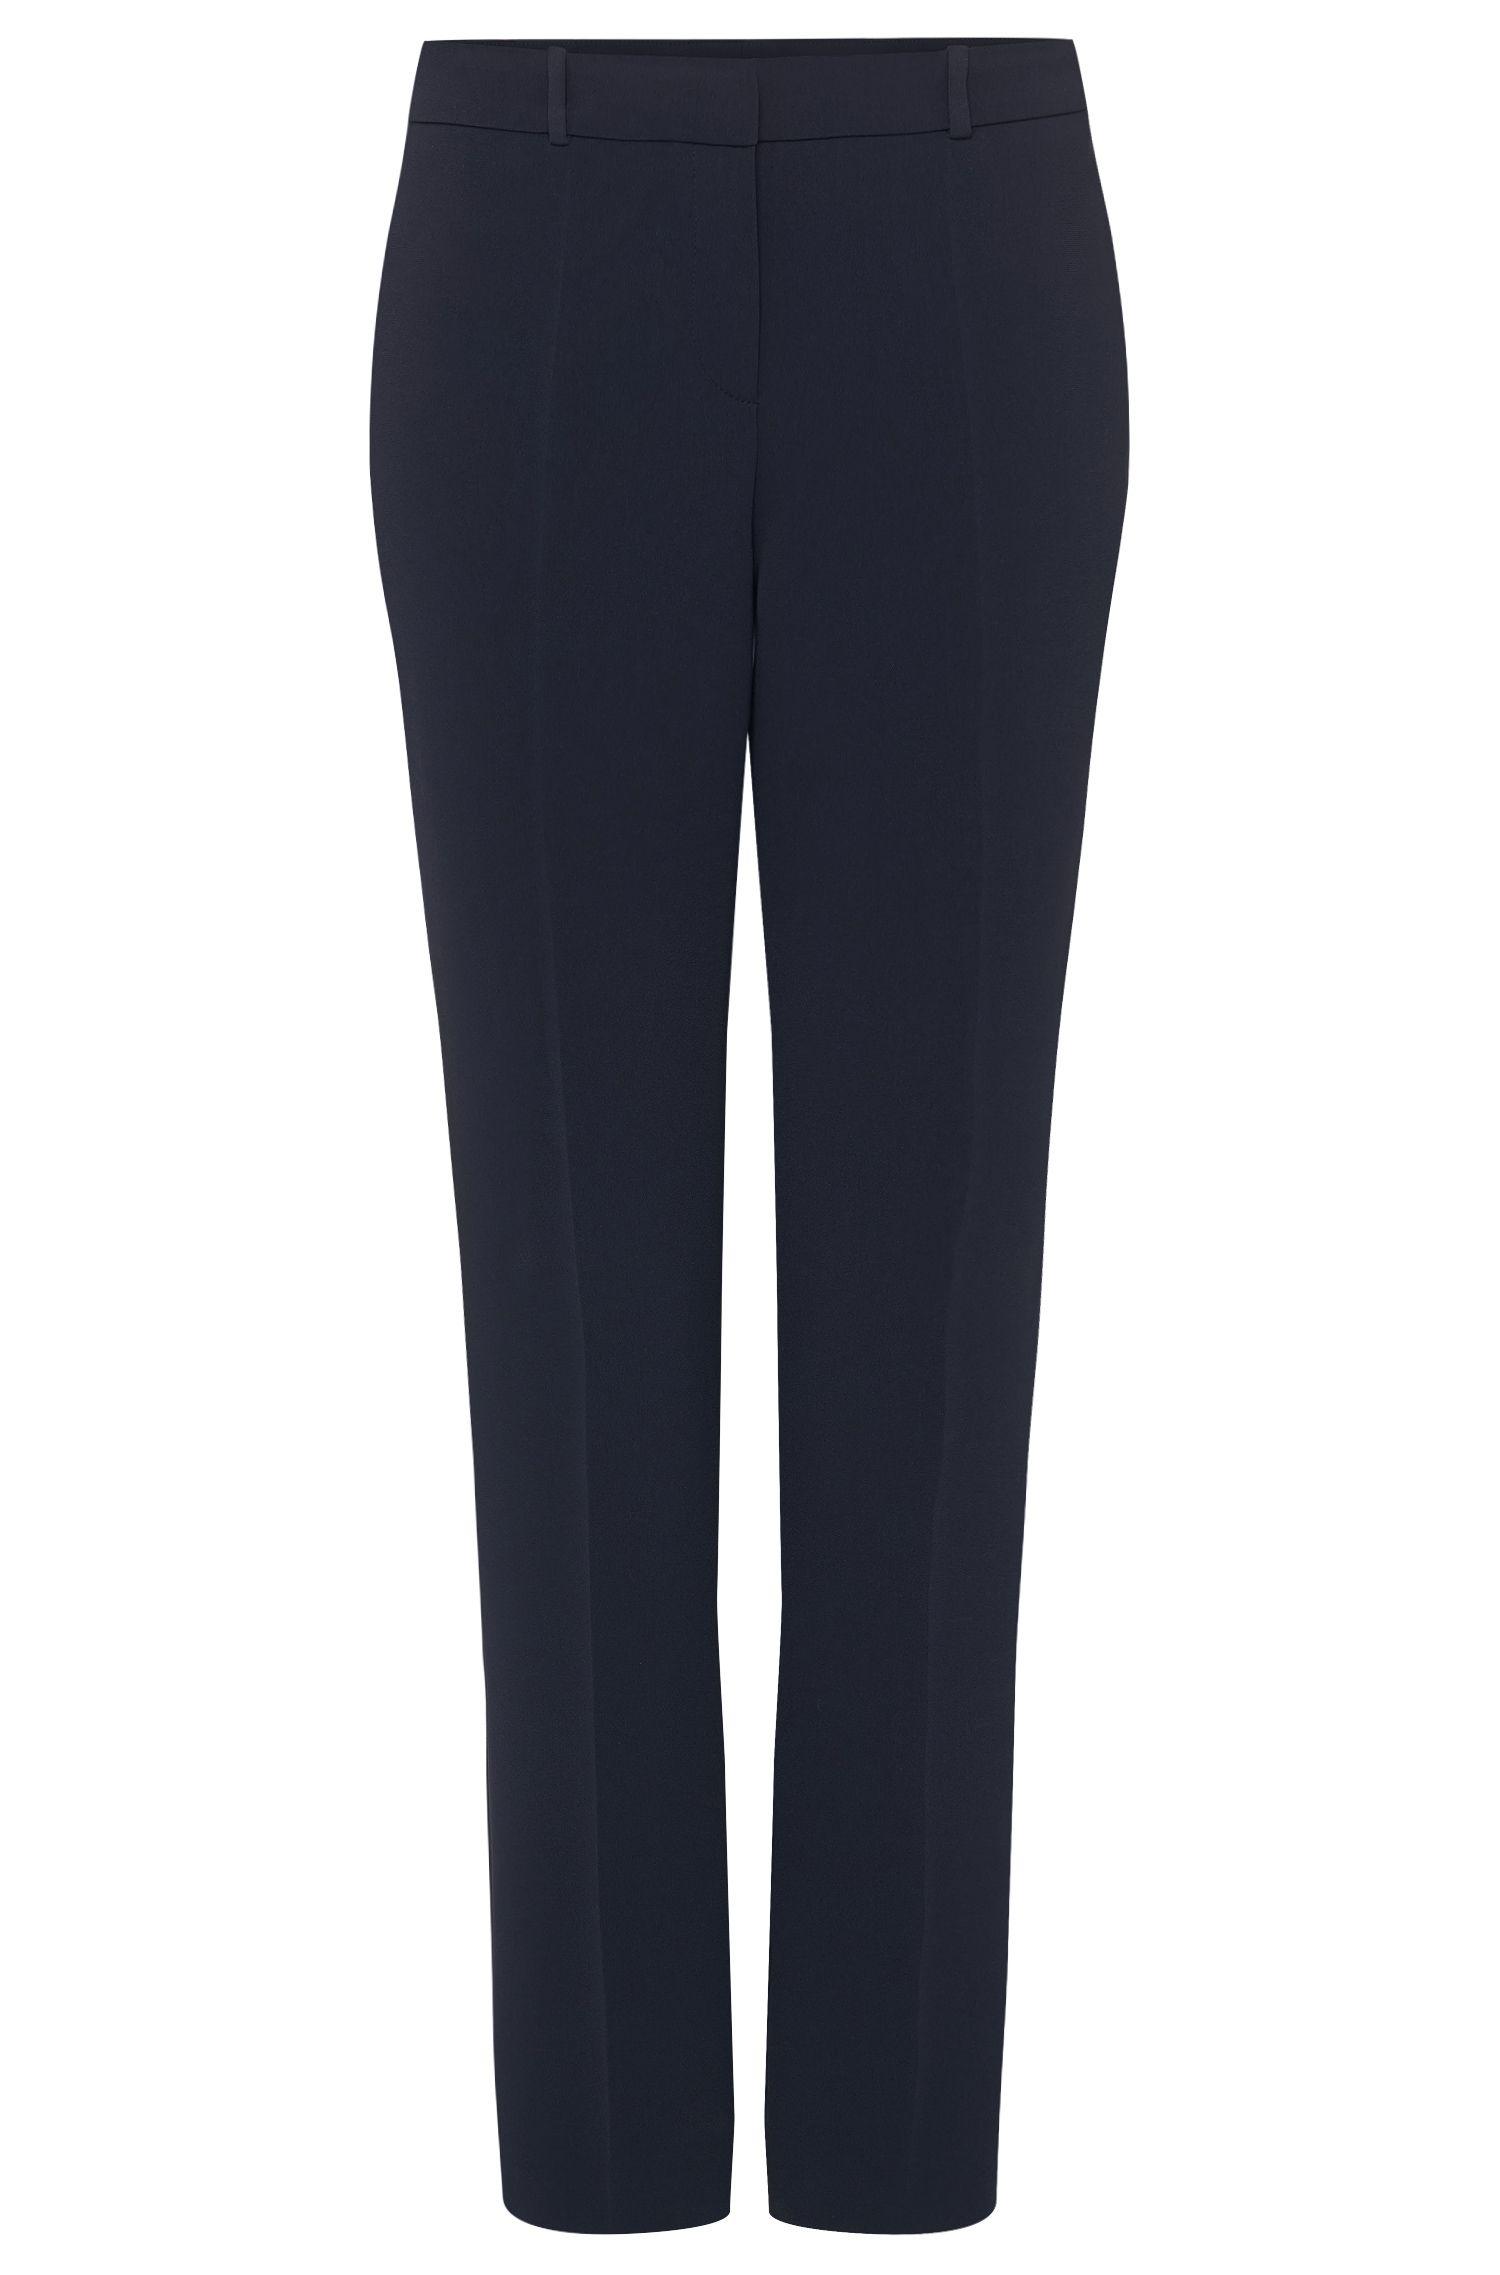 'Tiluna' | Crepe Slim-Leg Dress Pants